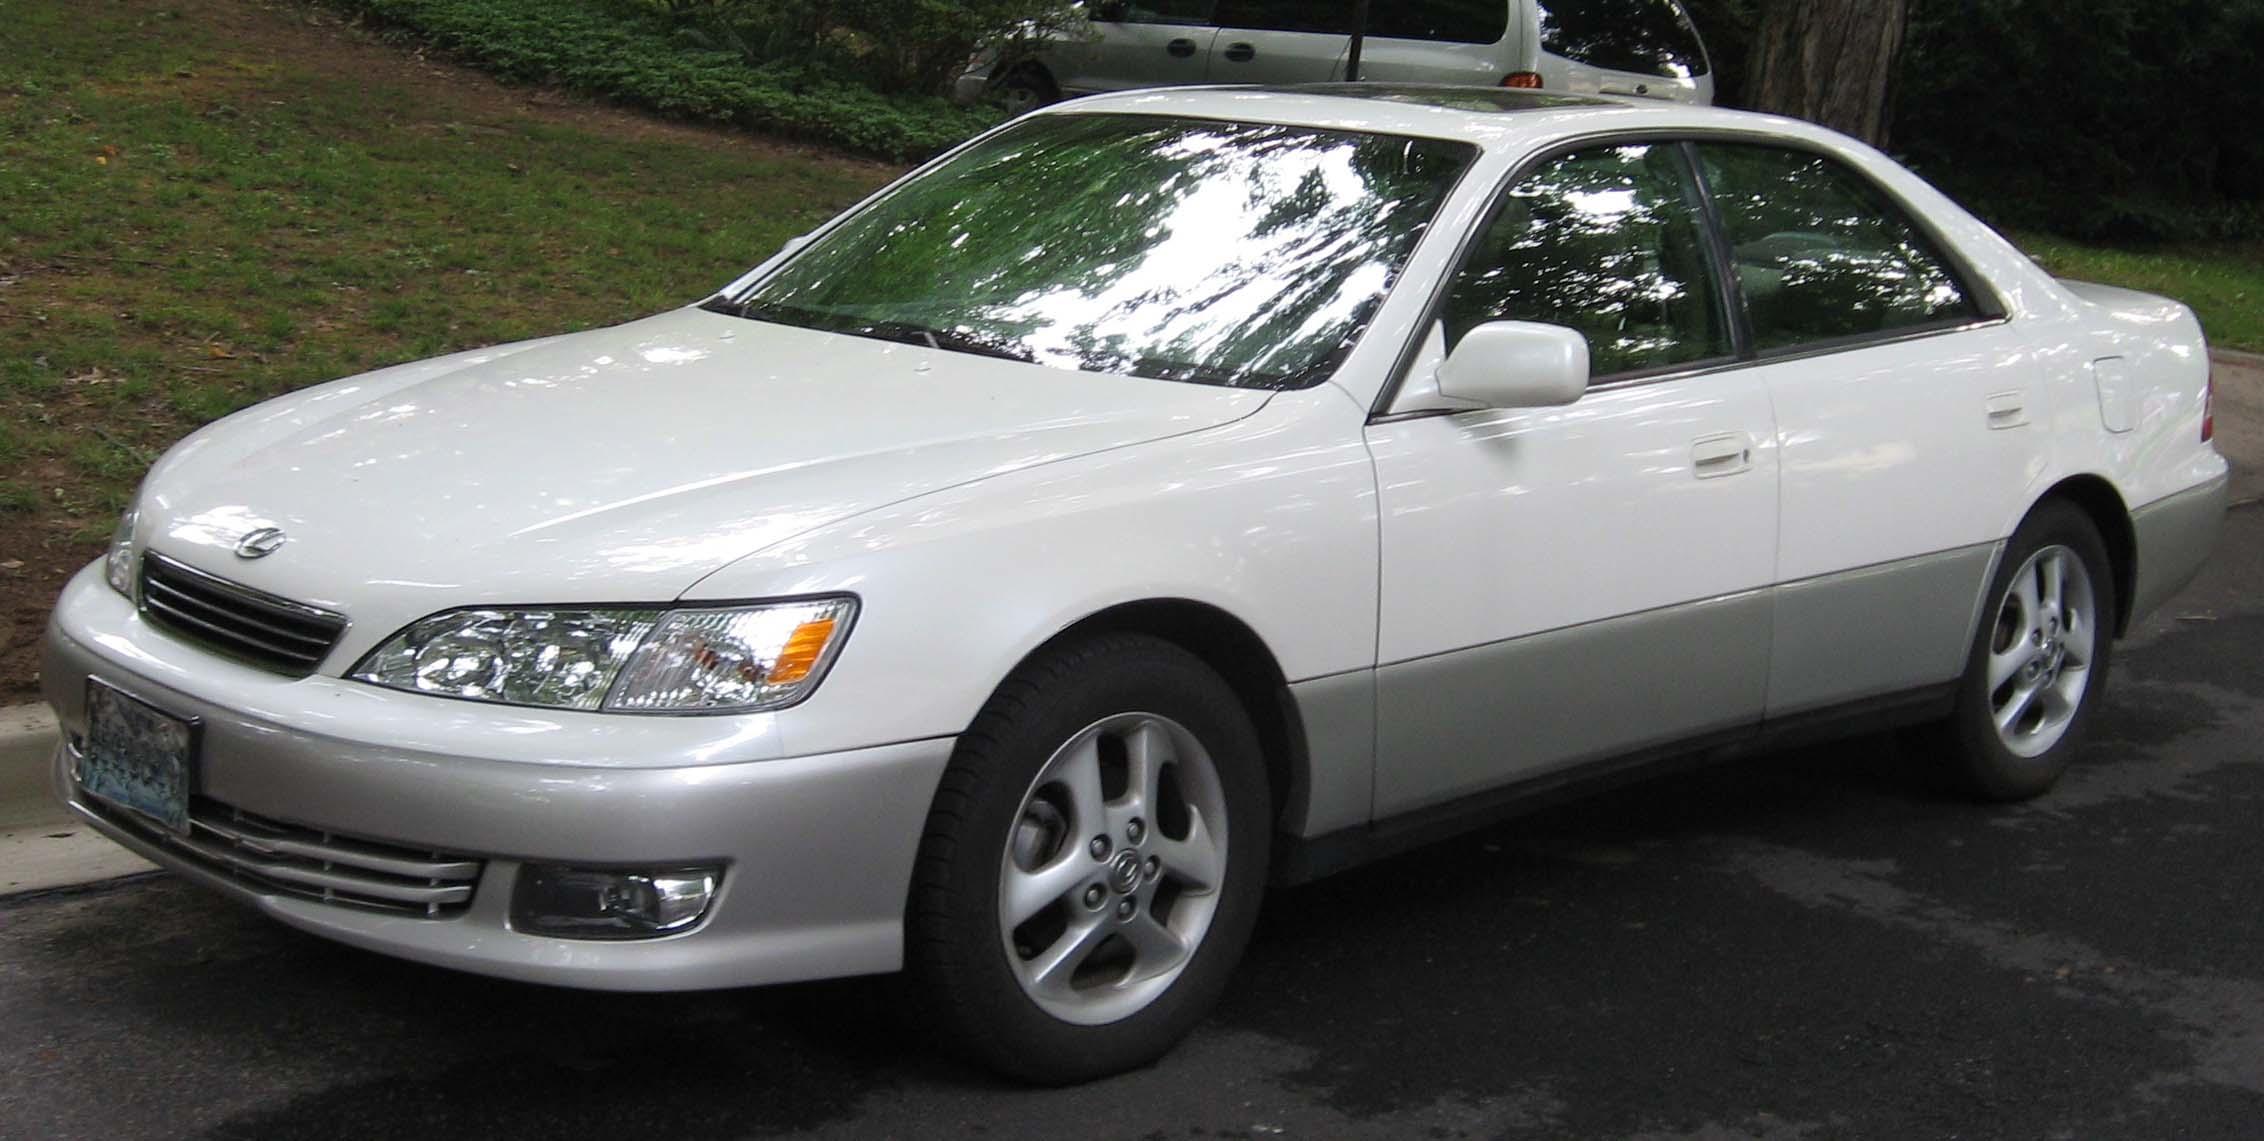 File:3rd Lexus ES300.jpg - Wikimedia Commons